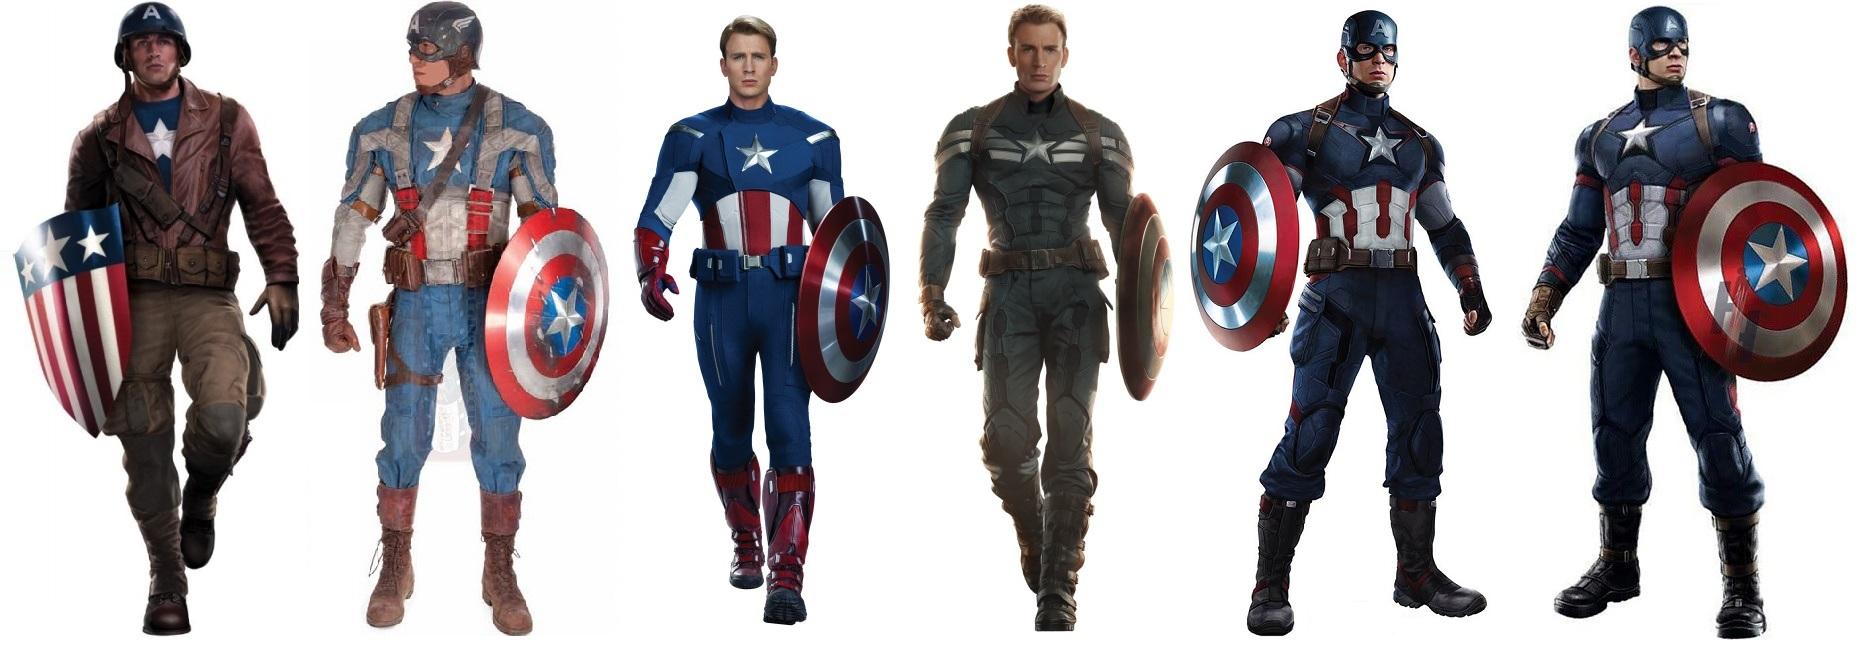 [Marvel] Captain America : Civil War (2016) - Page 4 Captain-america-costume-uniform-evolution-movie-avengers-civil-war